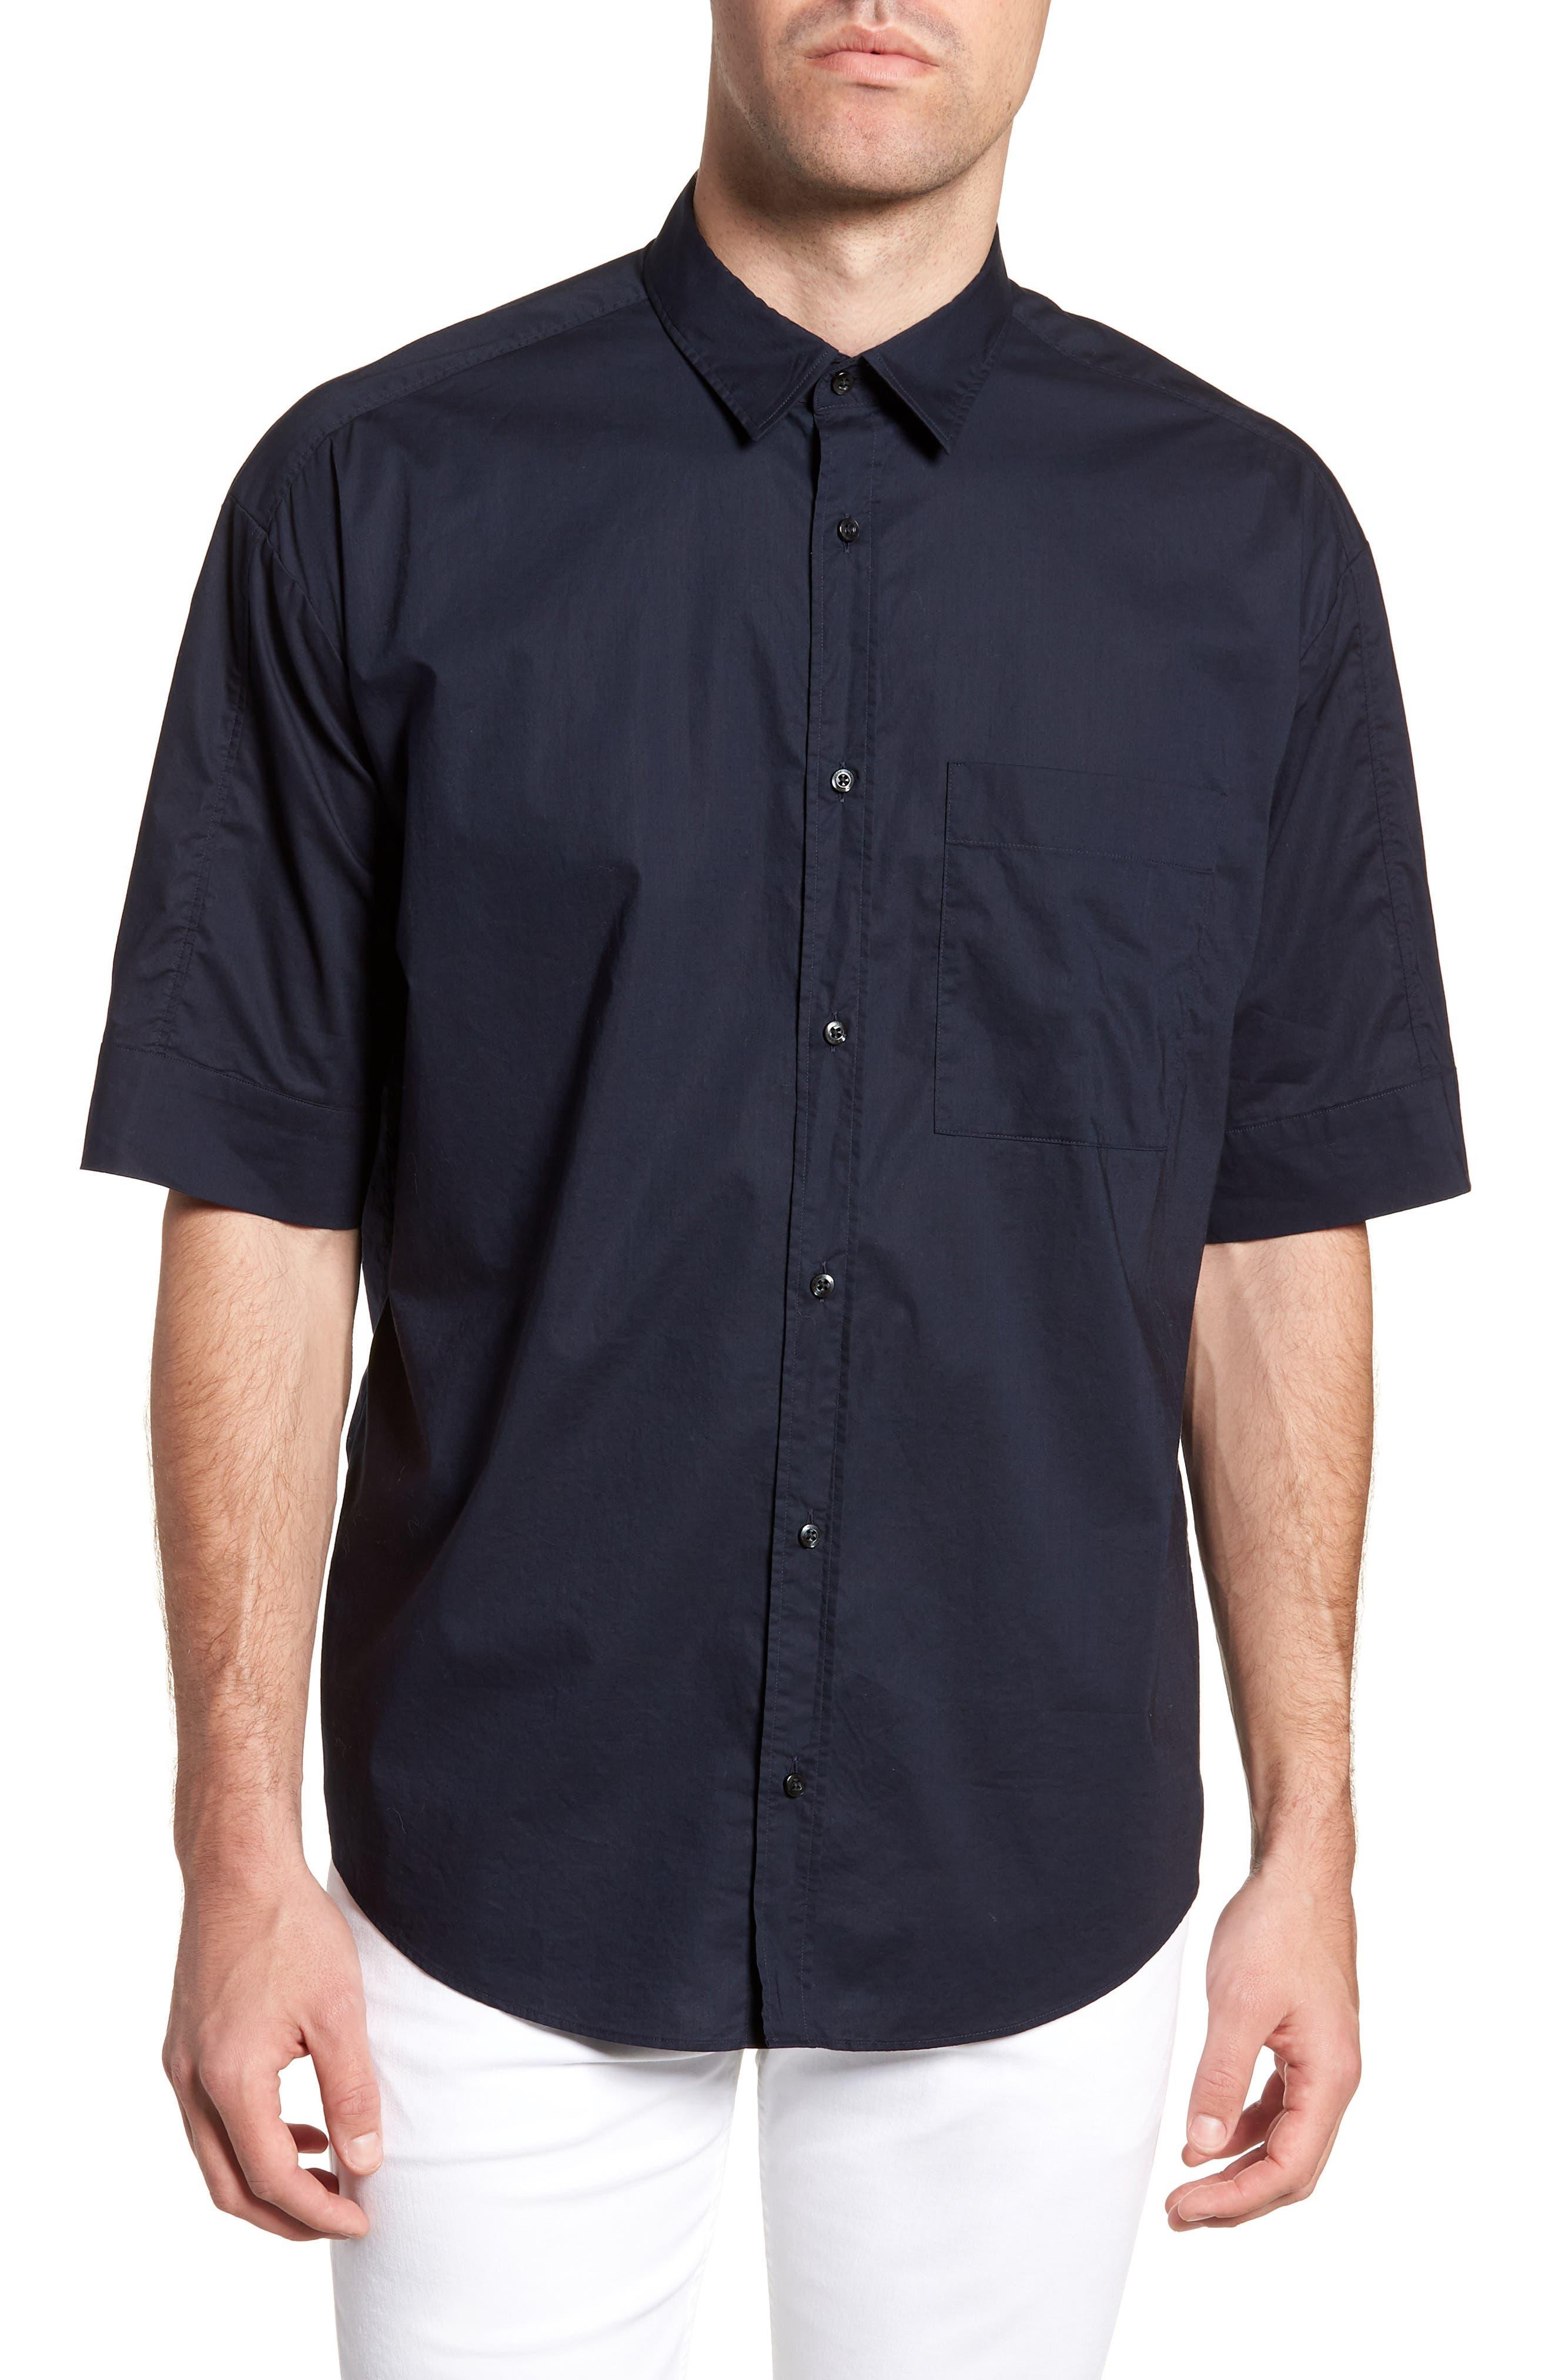 Eynold Oversized Short Sleeve Sport Shirt,                             Main thumbnail 1, color,                             413